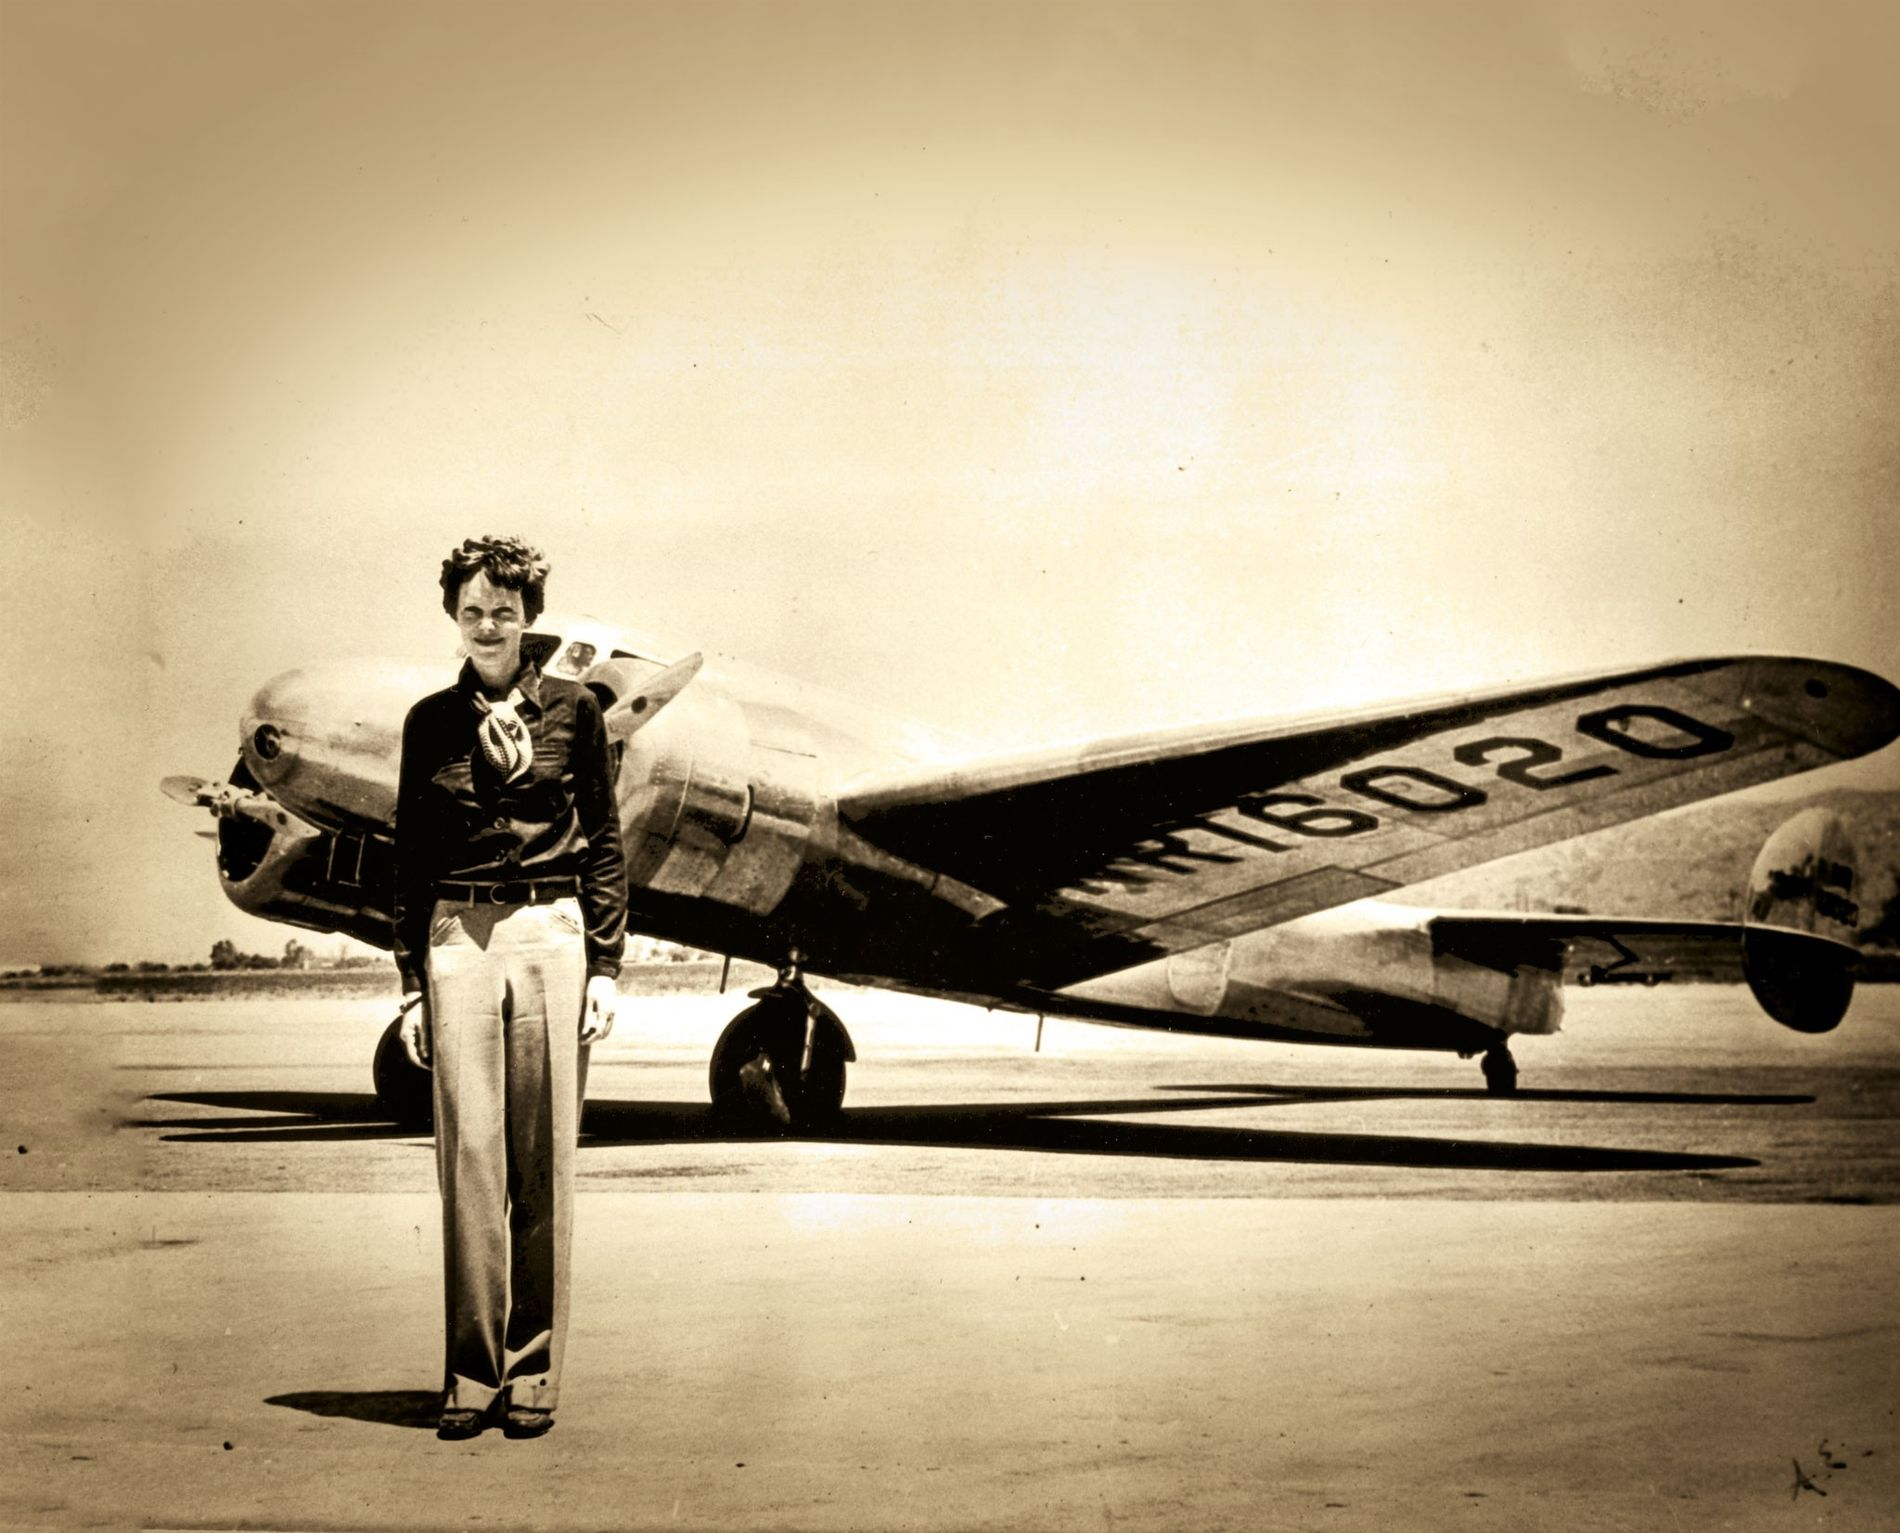 Amelia Earhart prend la pose devant son avion, le Lockheed Electra, à bord duquel elle a disparu en juillet 1937.